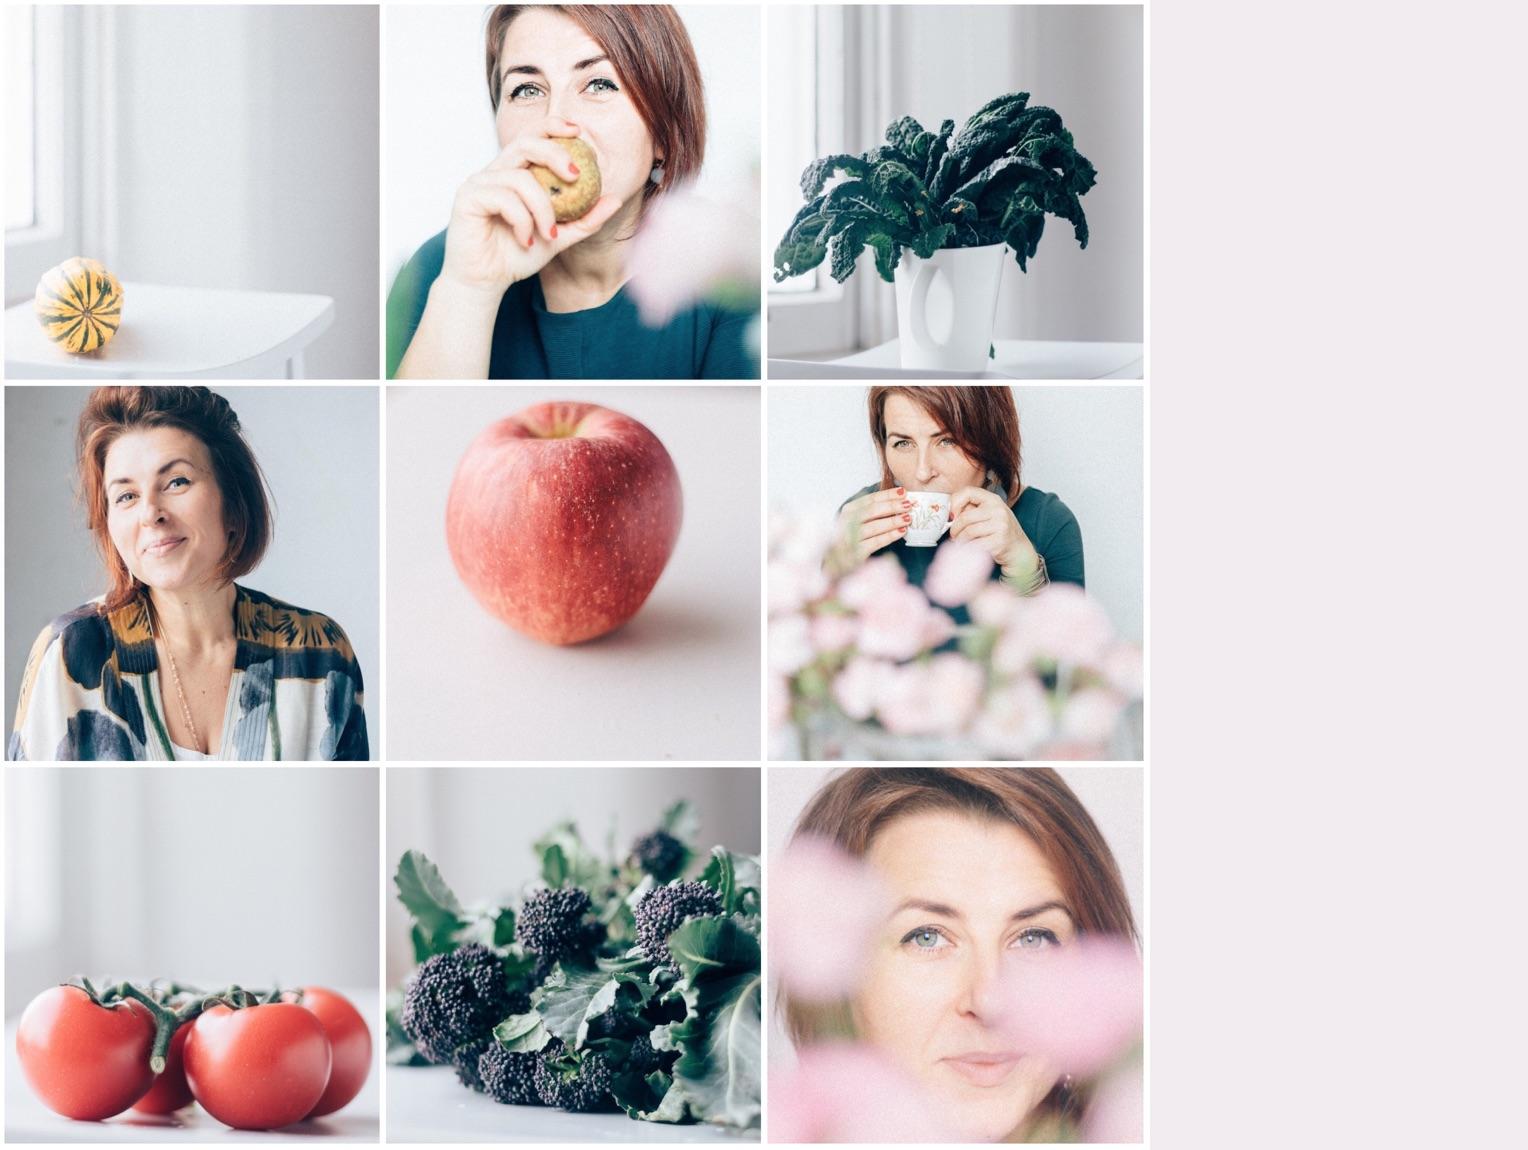 olga naturopathic doctor portrait photography london headshots greenwich content branding new business.jpg